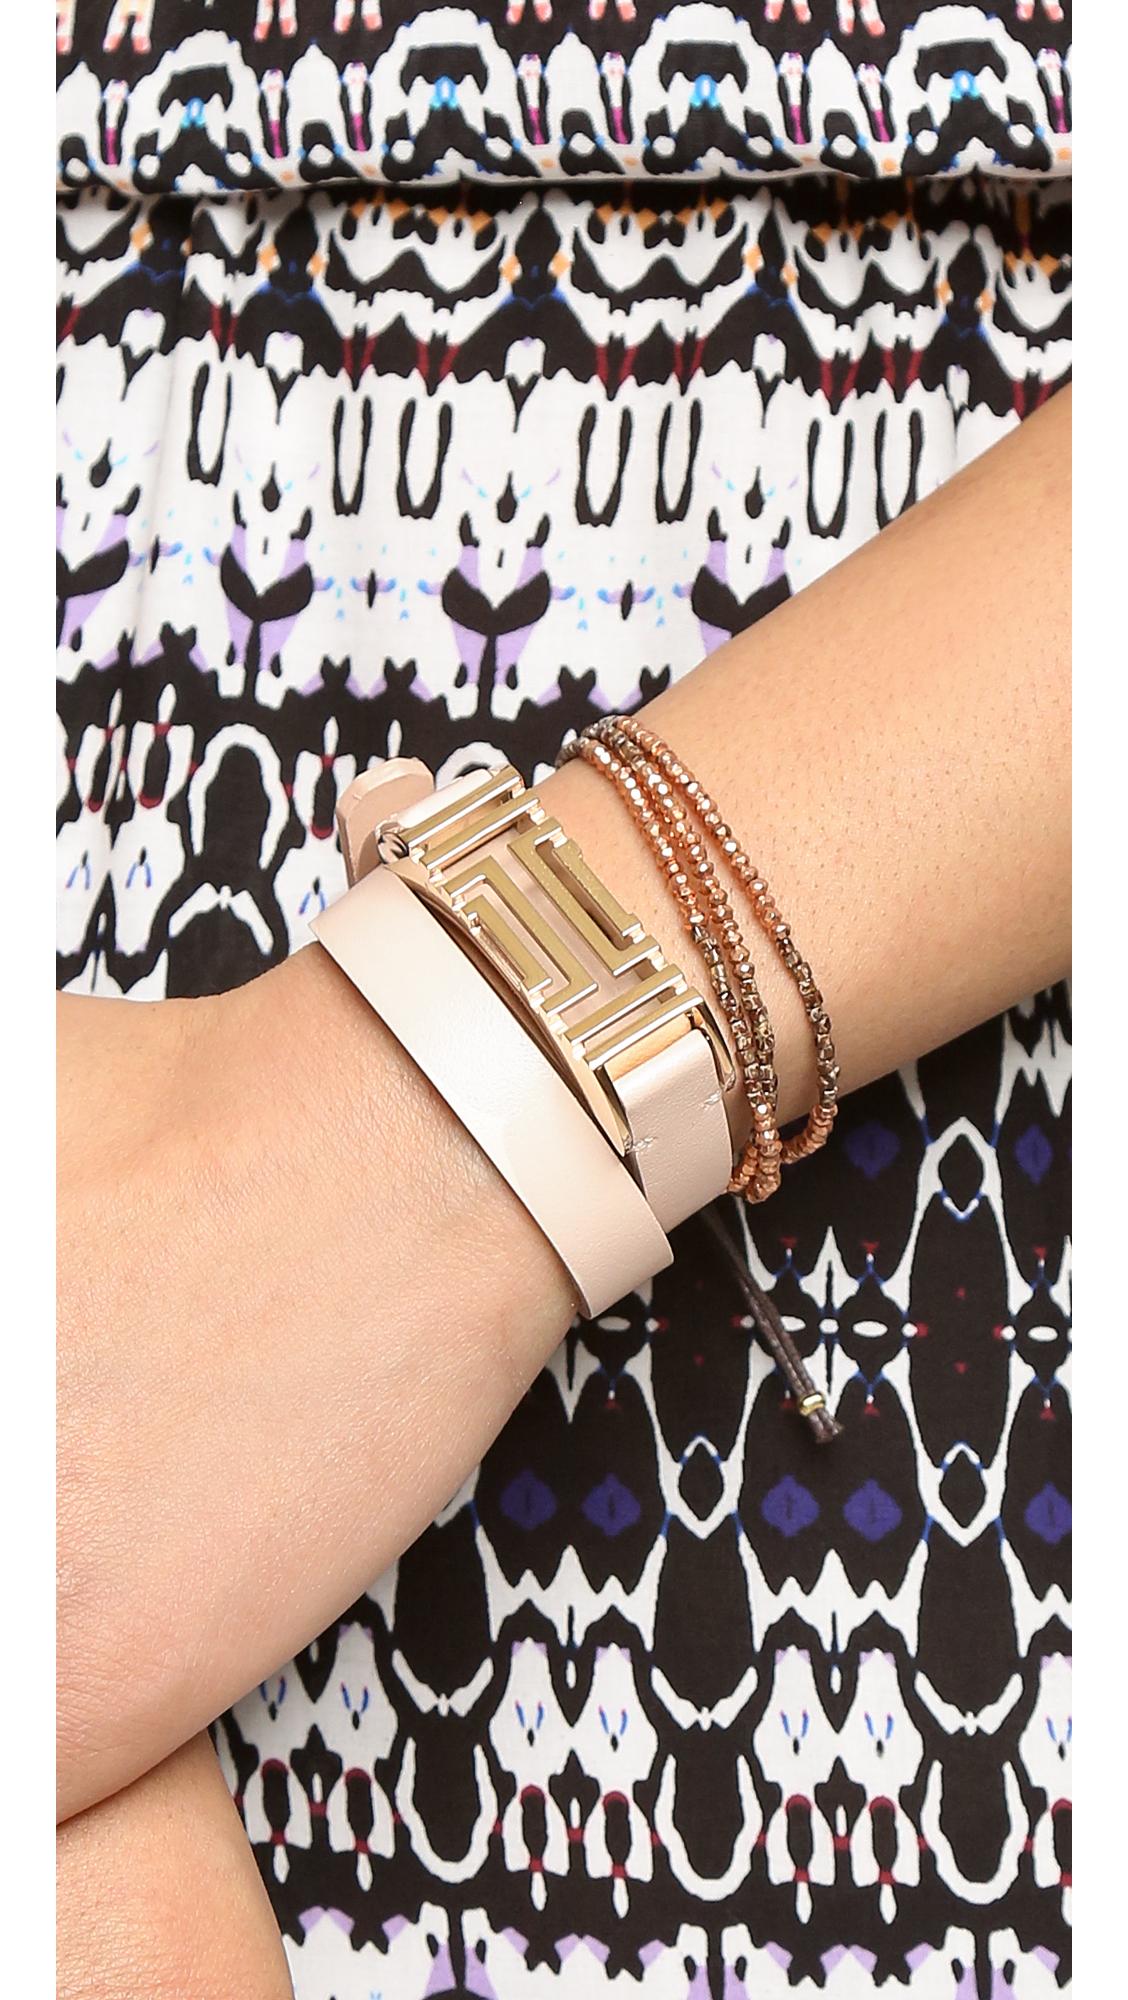 533e51024fb Tory Burch Tory Burch for Fitbit Fret Double Wrap Bracelet